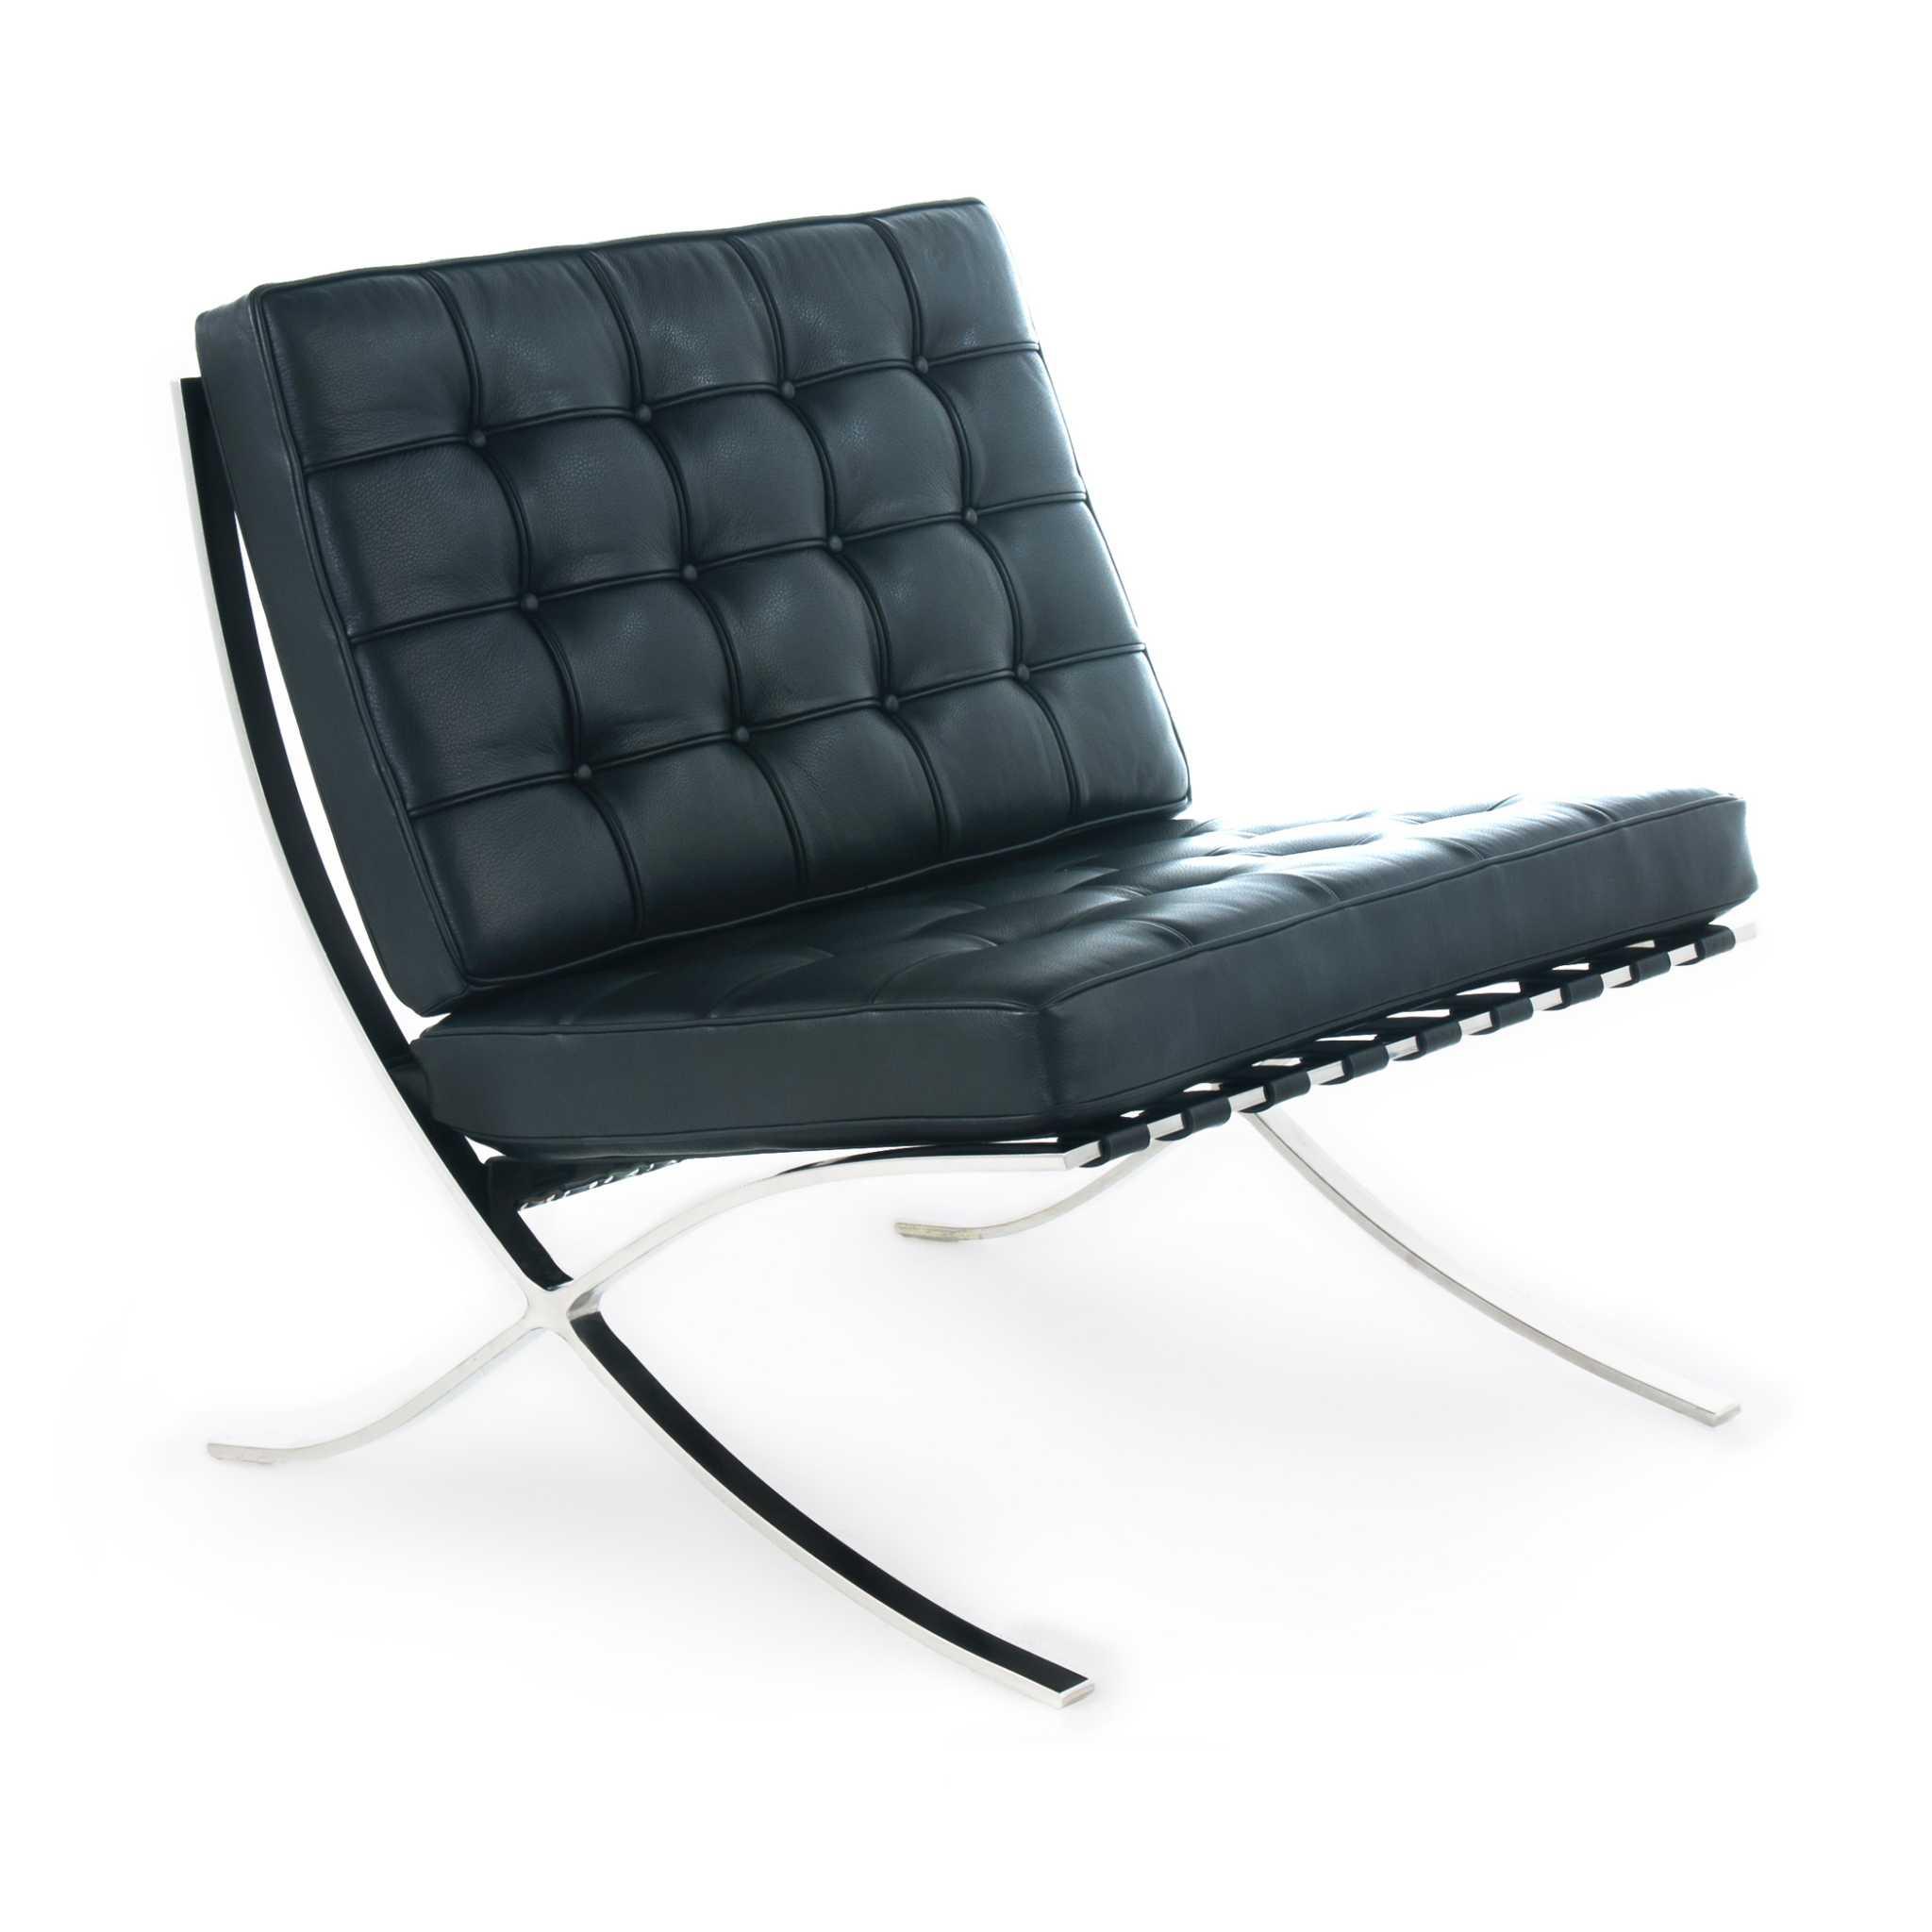 Rove Pavilion Chair